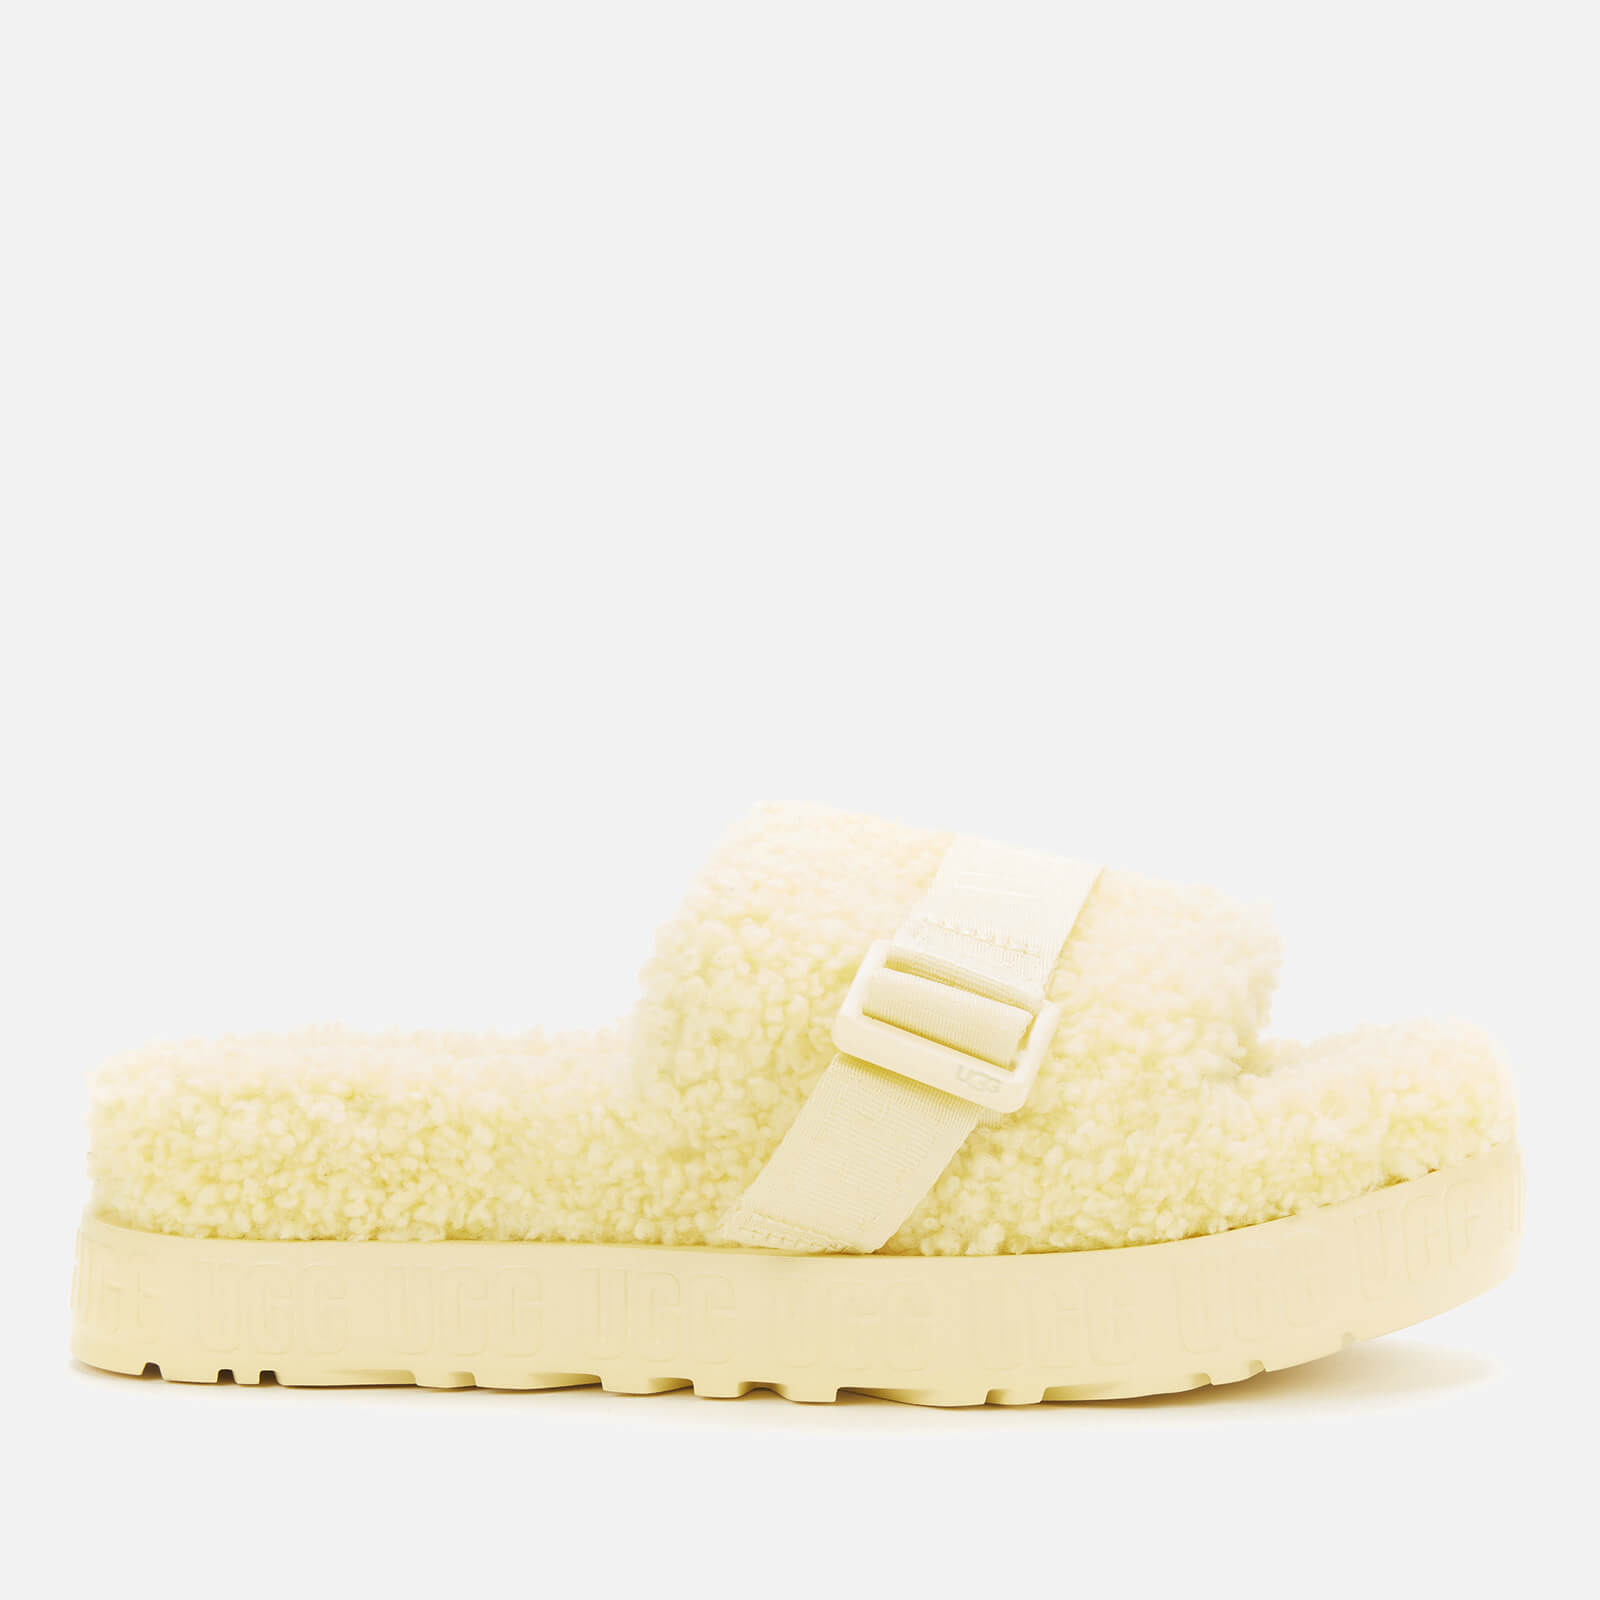 Ugg Women's Fluffita Sheepskin Slide Sandals - Margarita - Uk 3